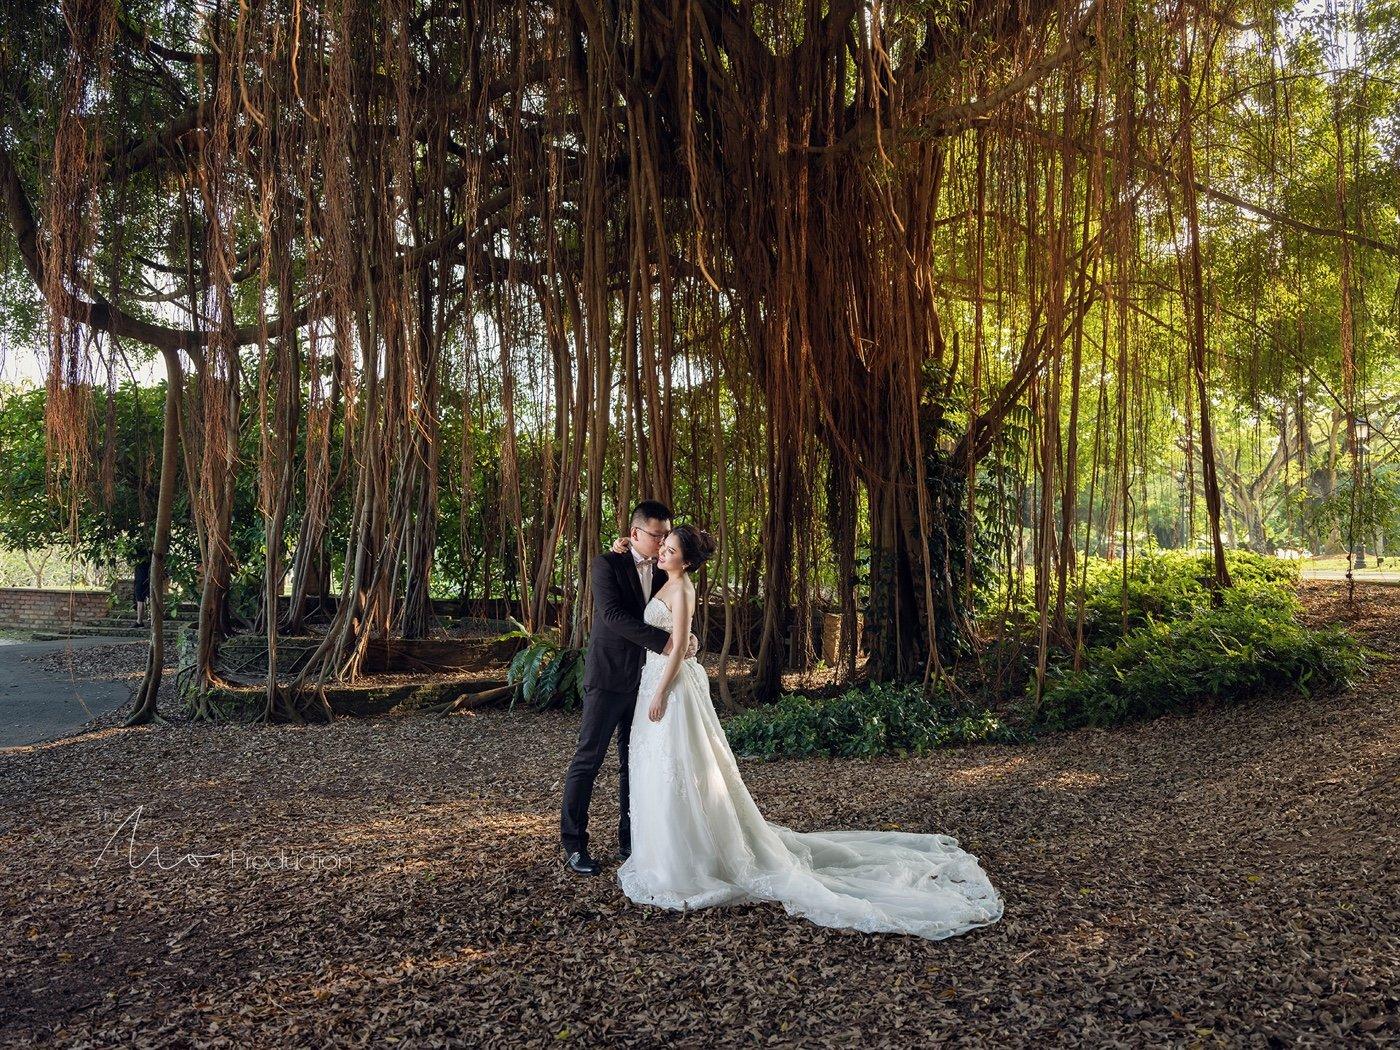 MoFoTo 旅拍婚纱 新加坡0